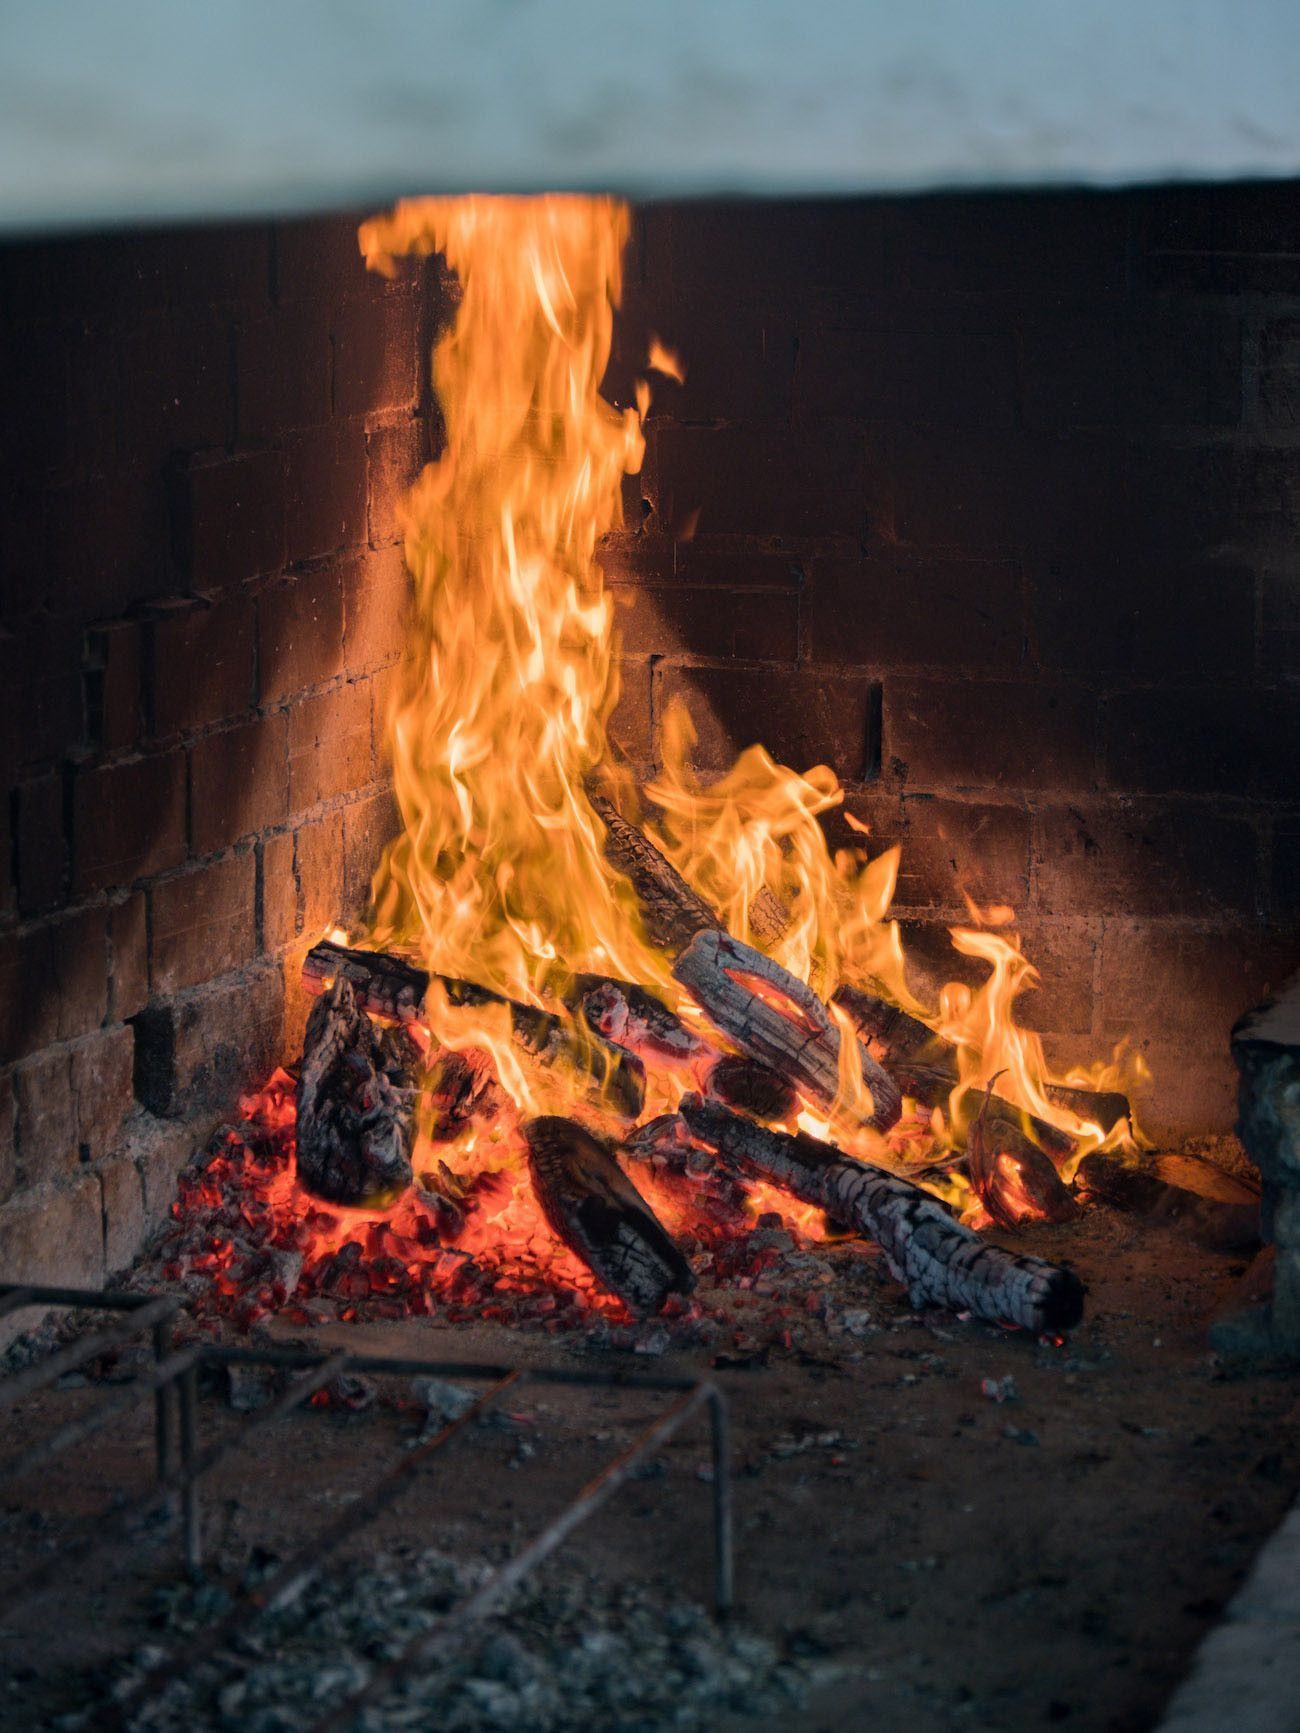 Weinguide Stellenbosch, Middelvlei, Feuer, Braai